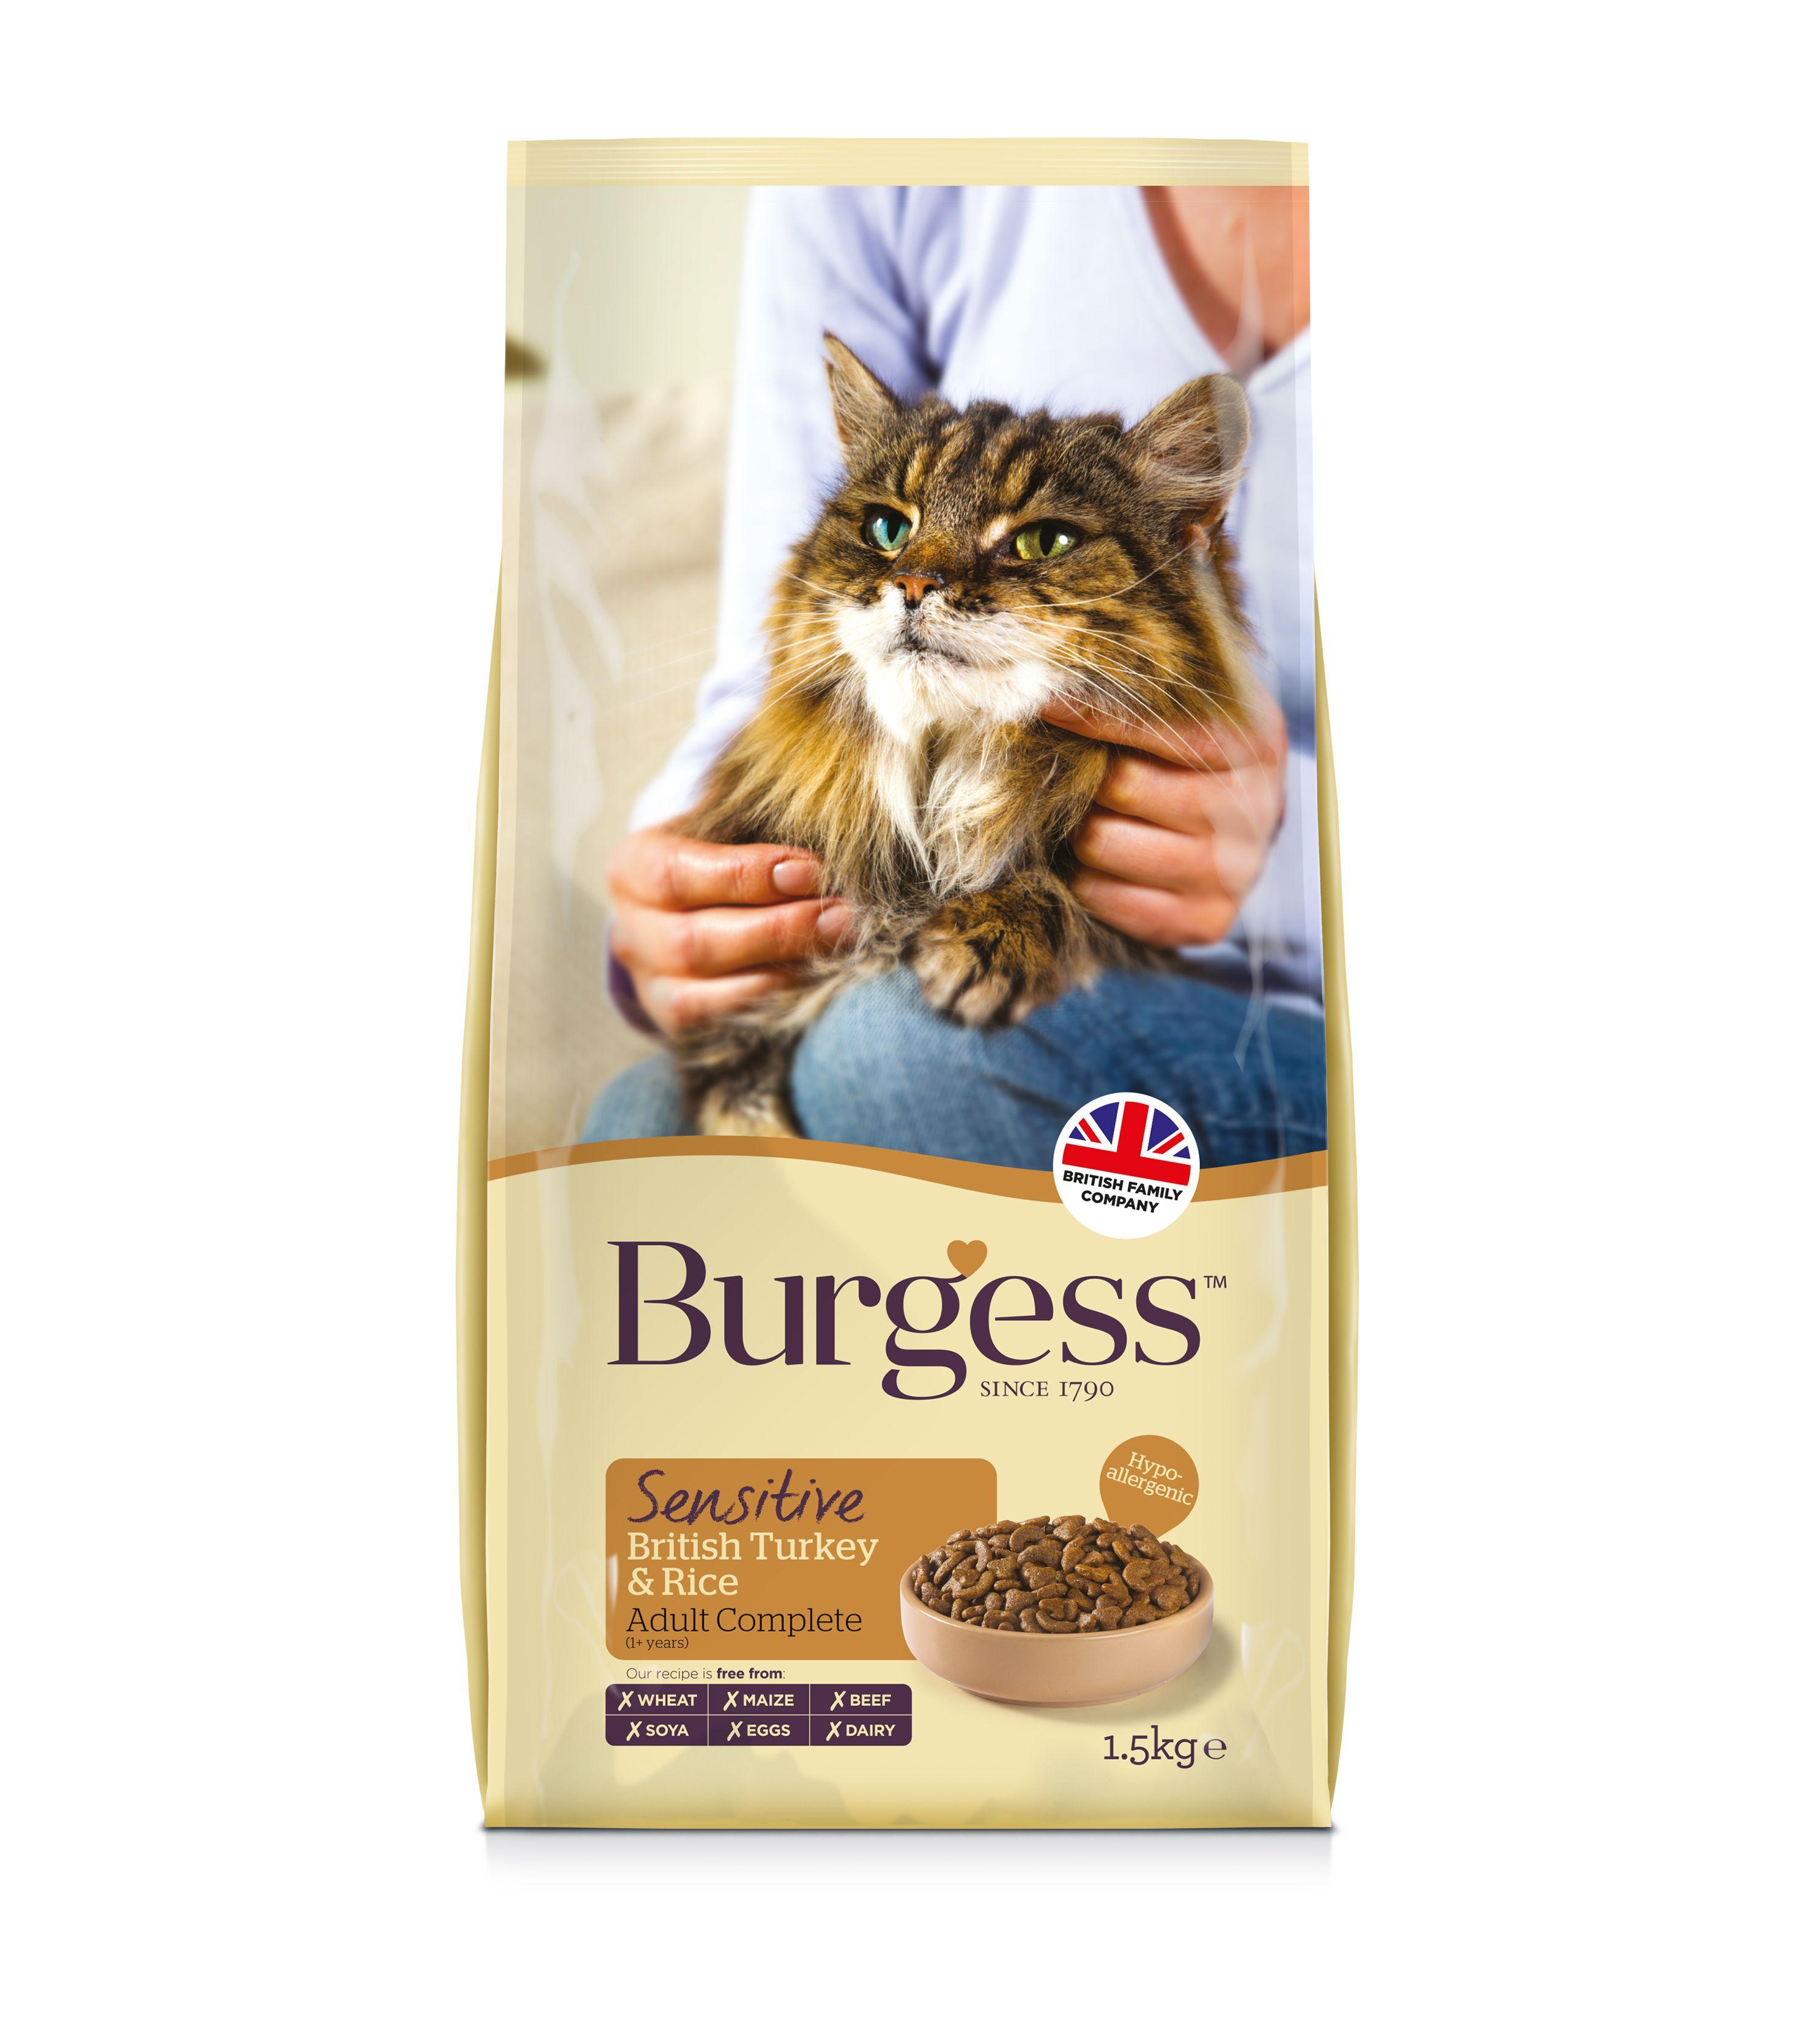 Burgess Sensitive Cat Turkey & Rice (With images) Cat